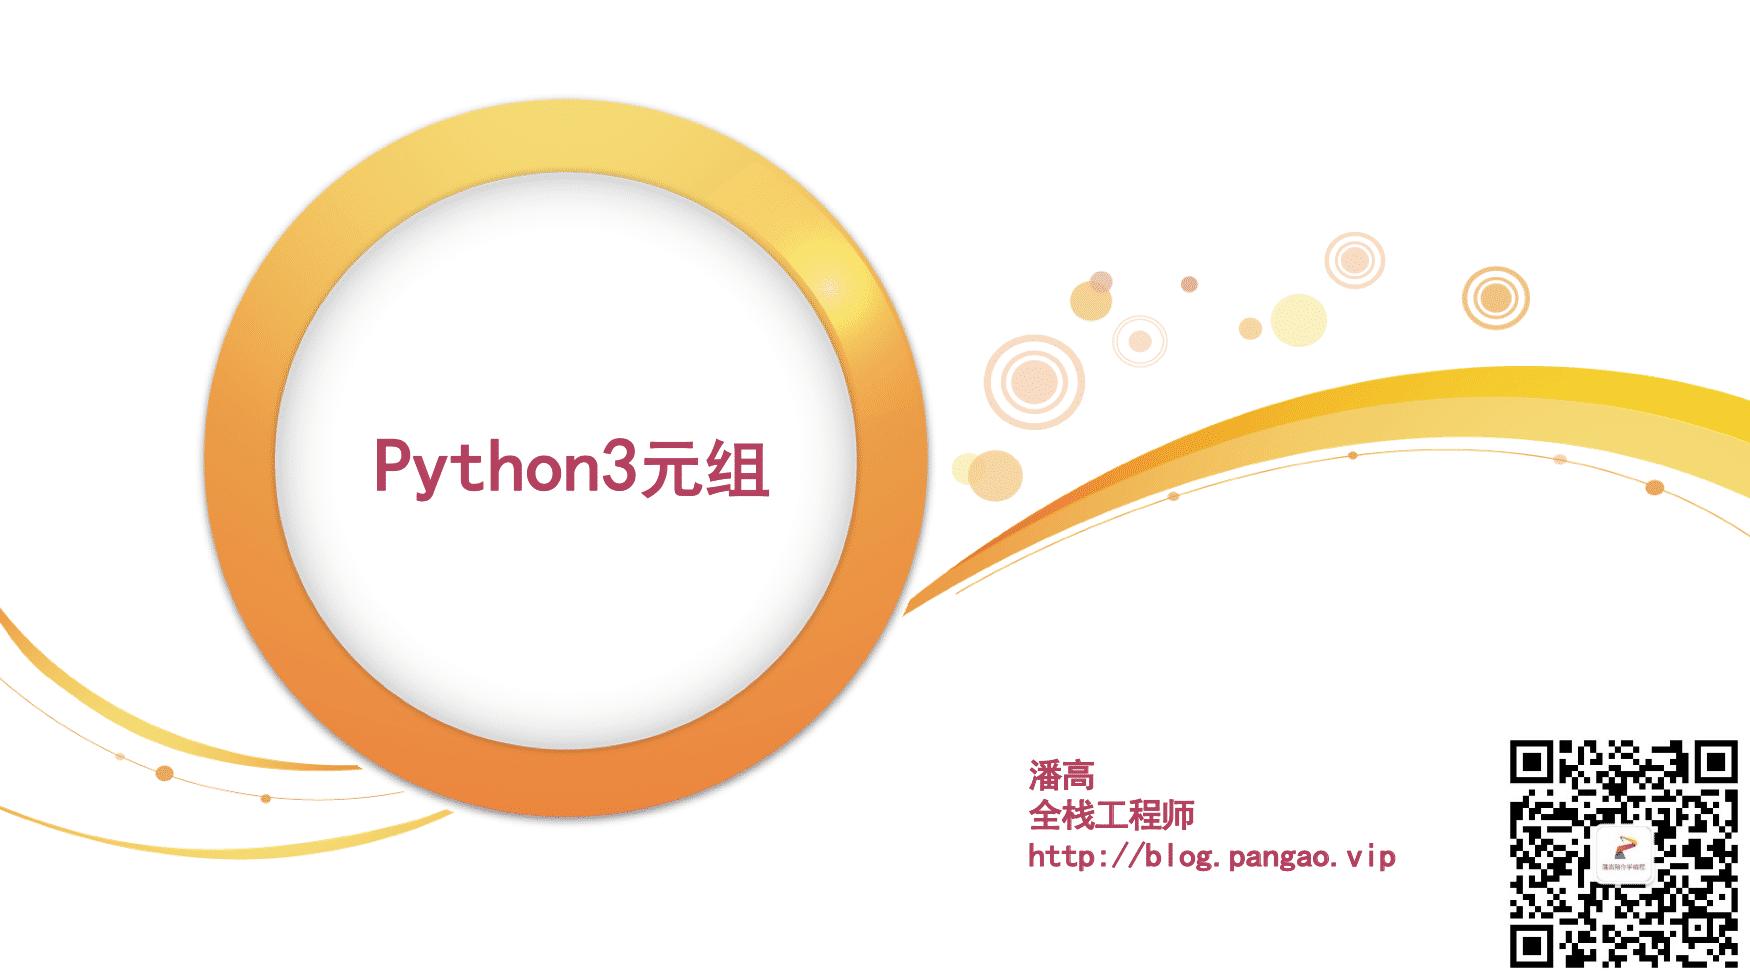 Python3元组-Python入门到精通